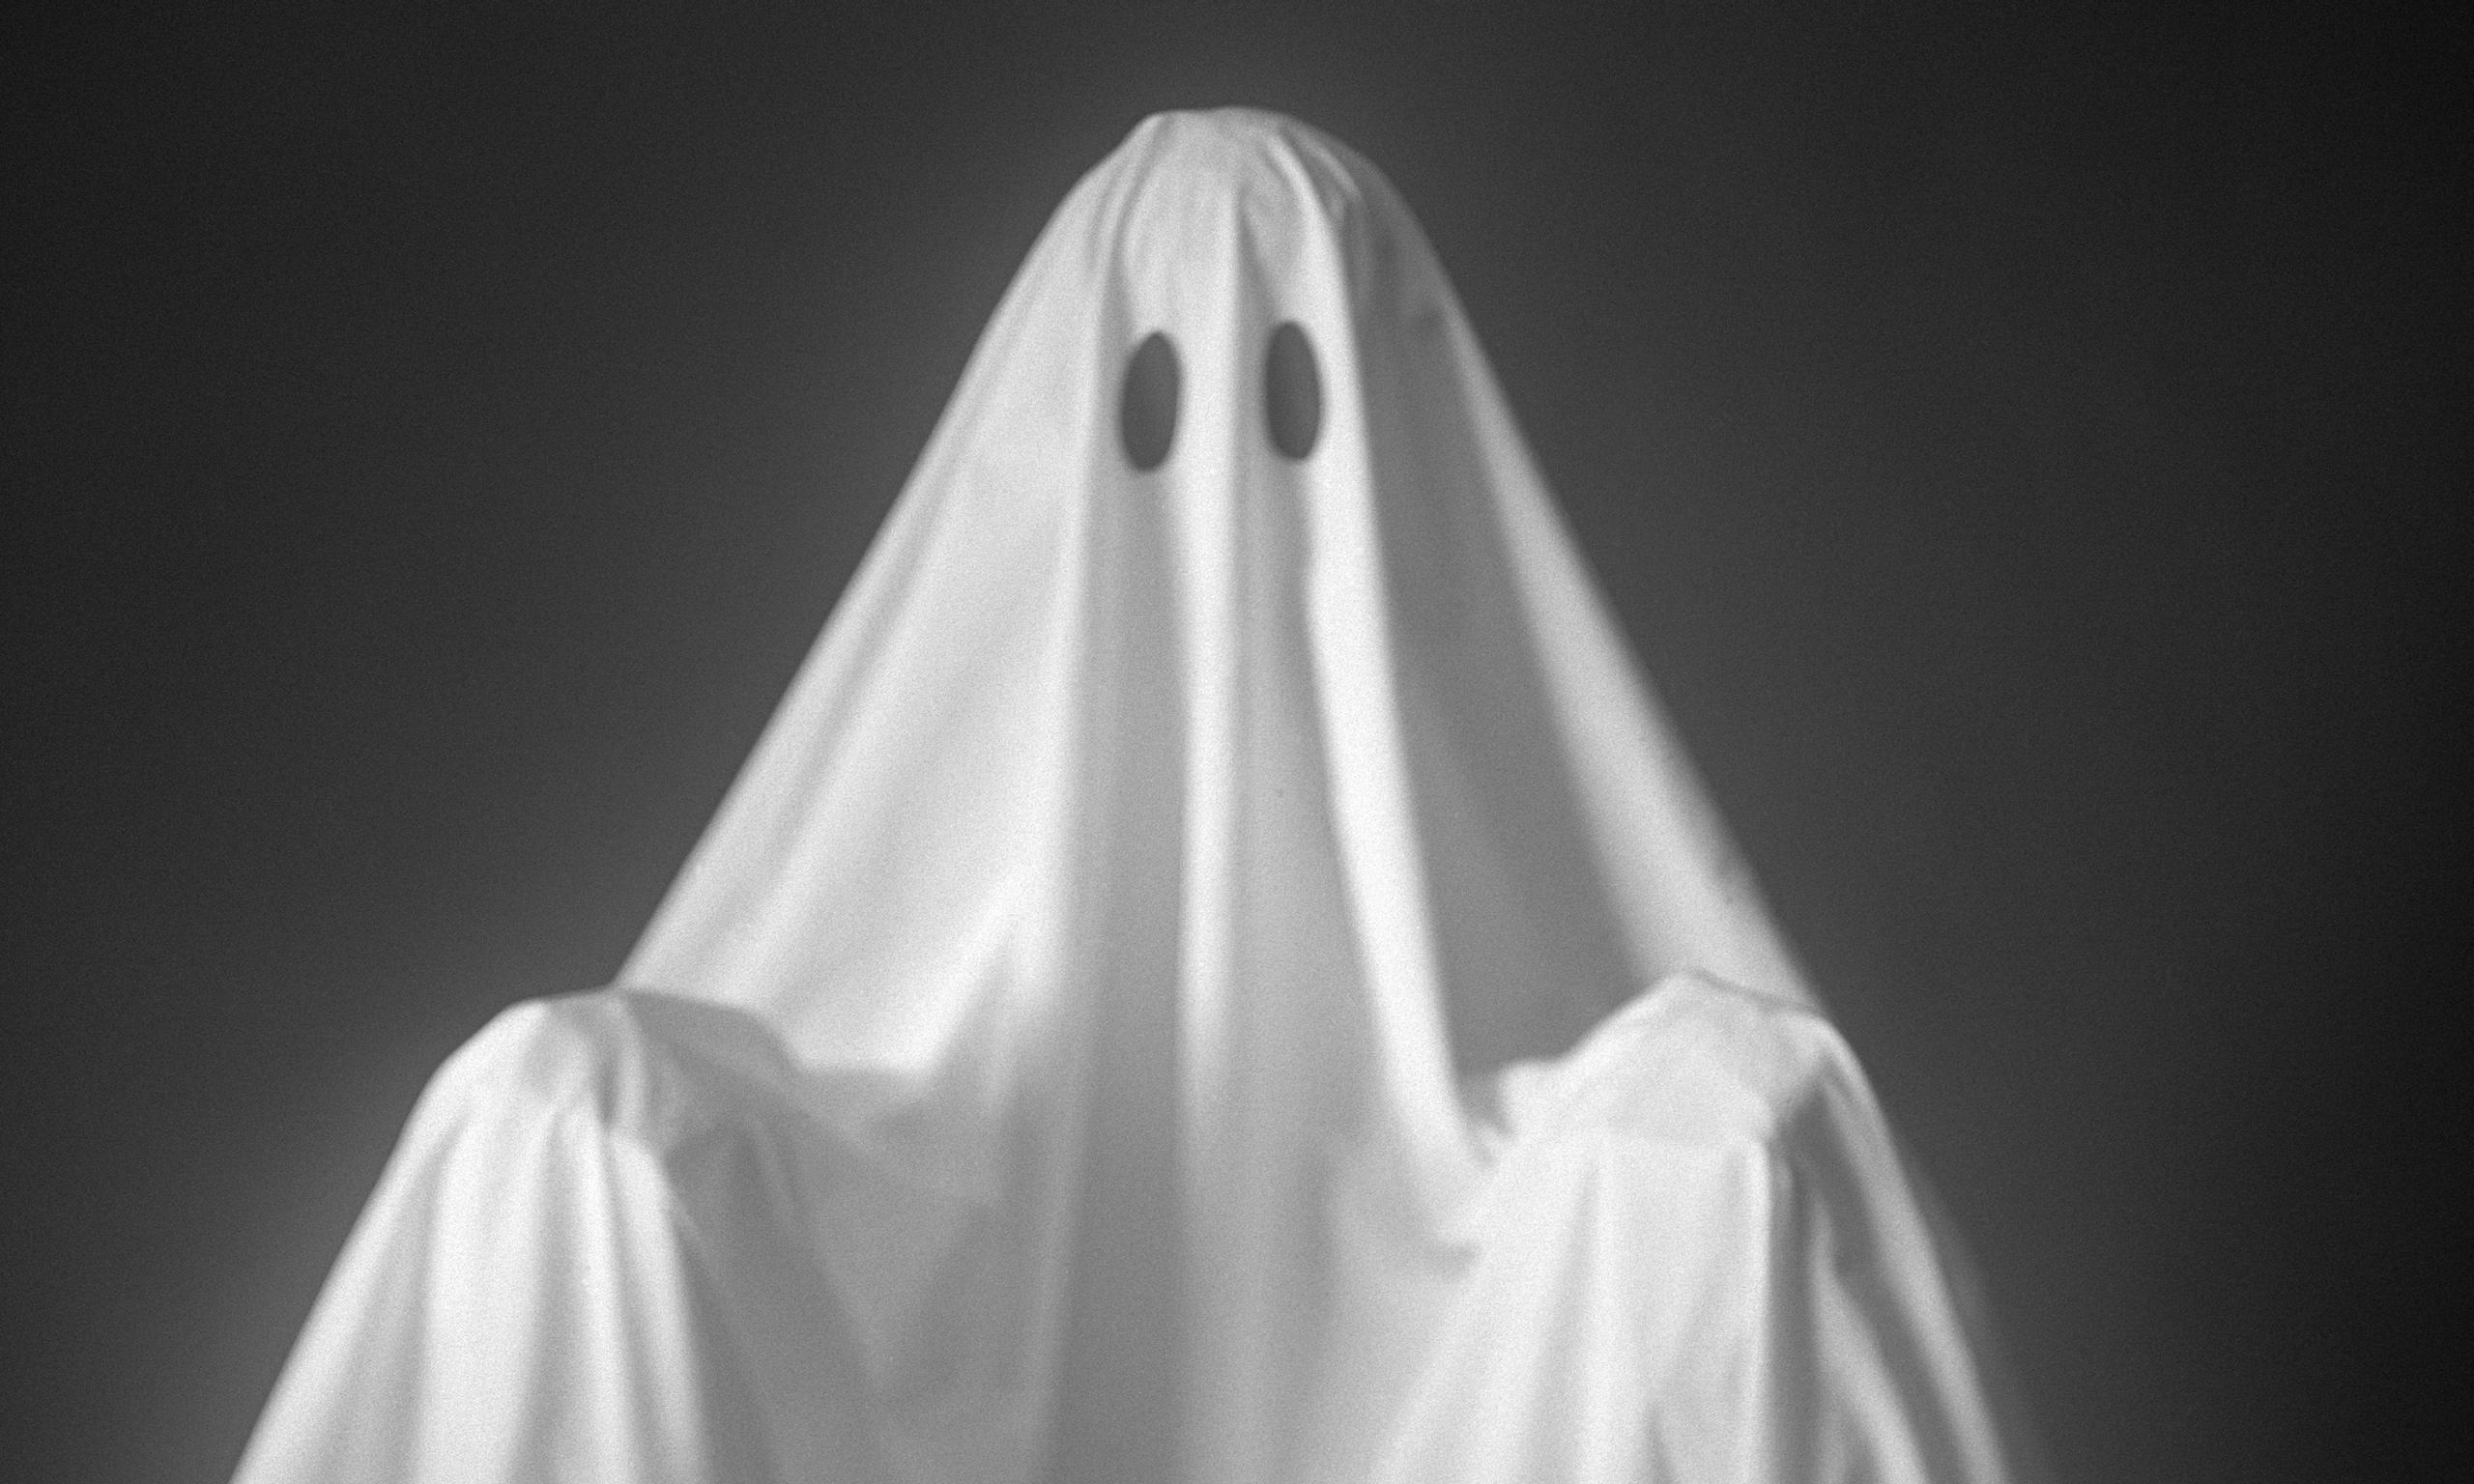 Quítale las sábanas al fantasma